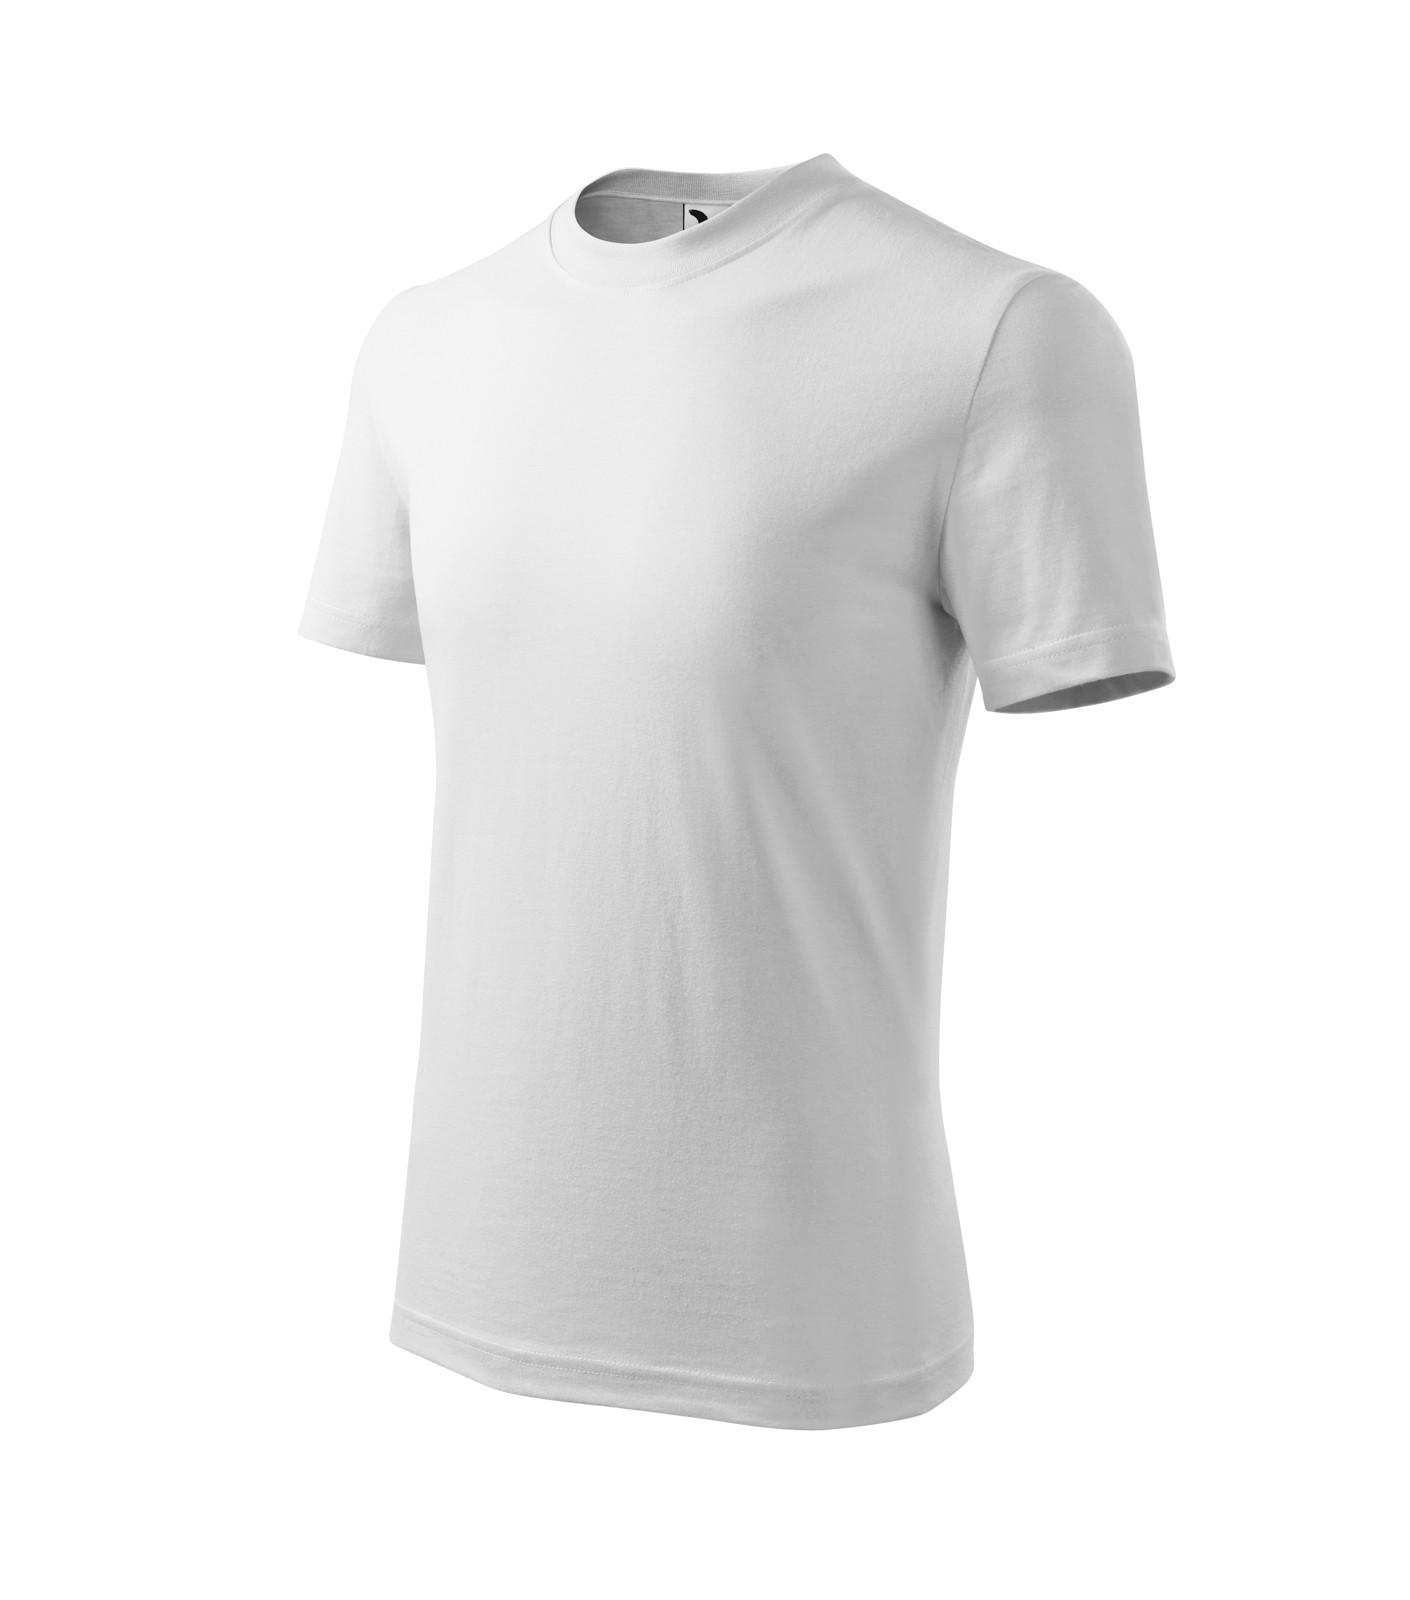 Tričko dětské Malfini Classic - Bílá / 158 cm/12 let